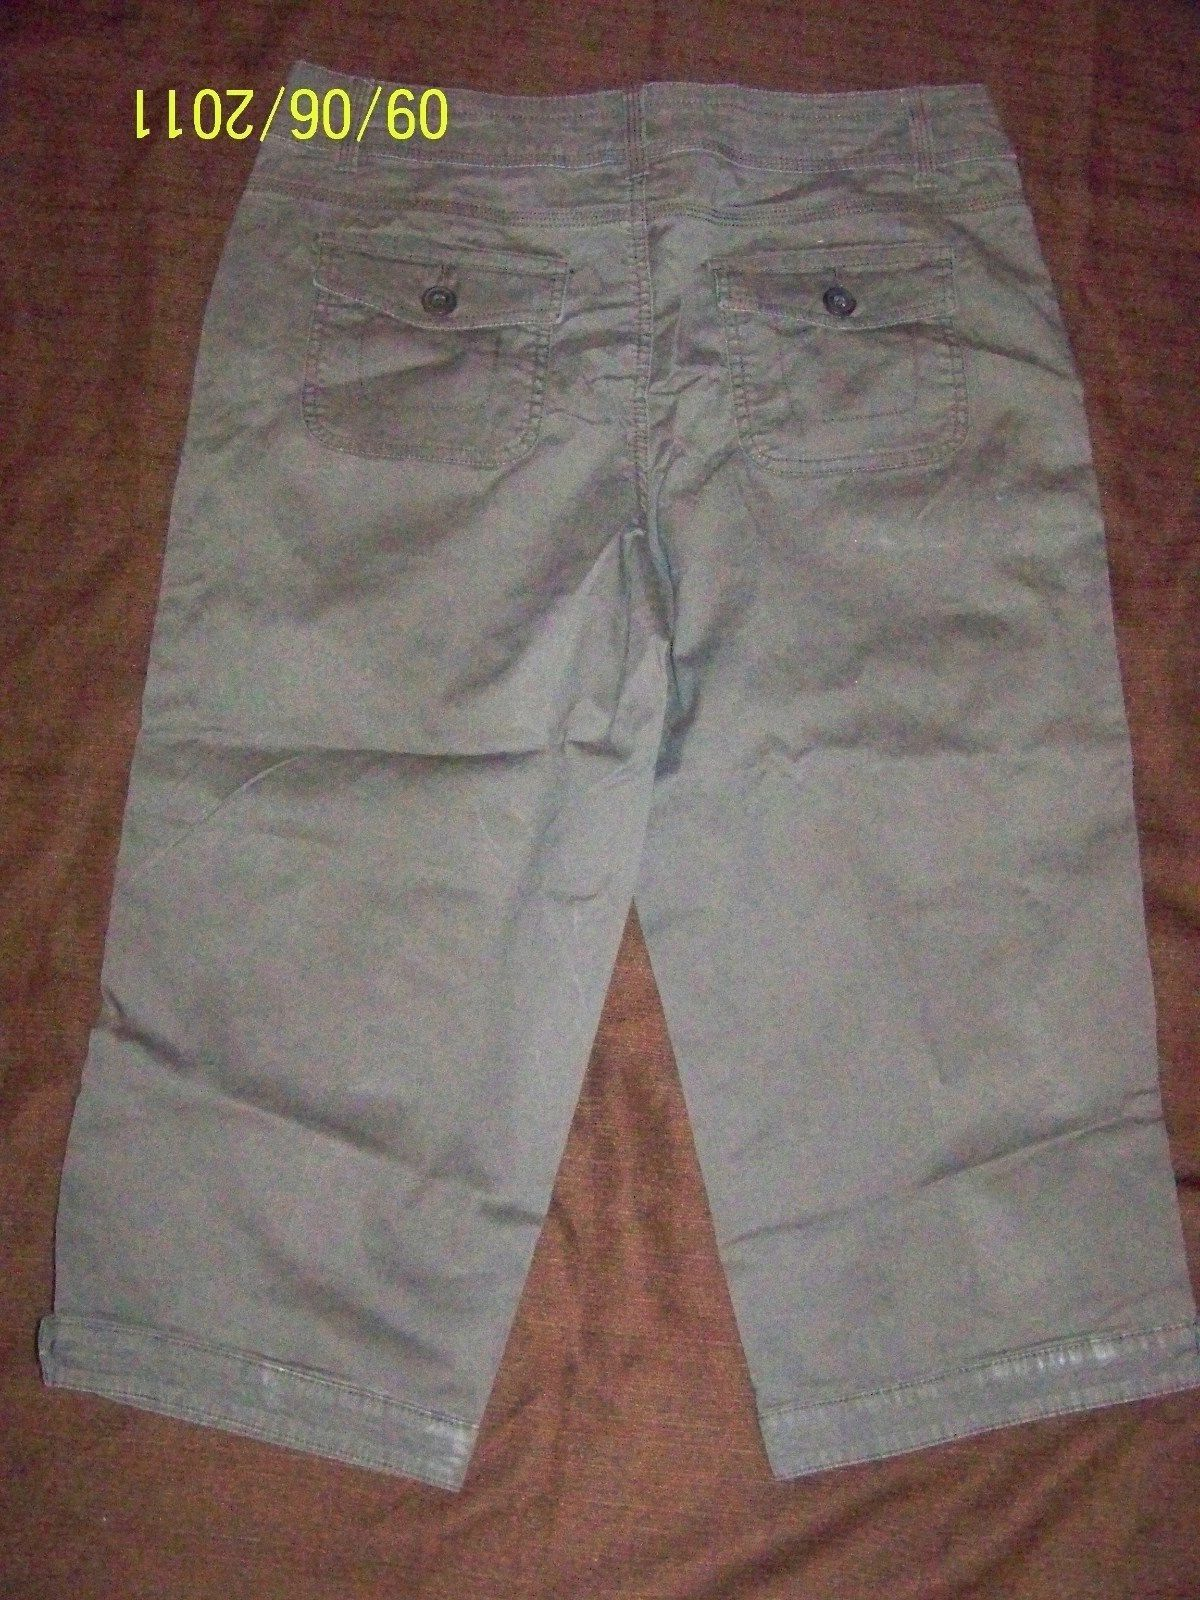 NWOT Women's Sonoma Lifestyle Pants size 6, Color: Brown